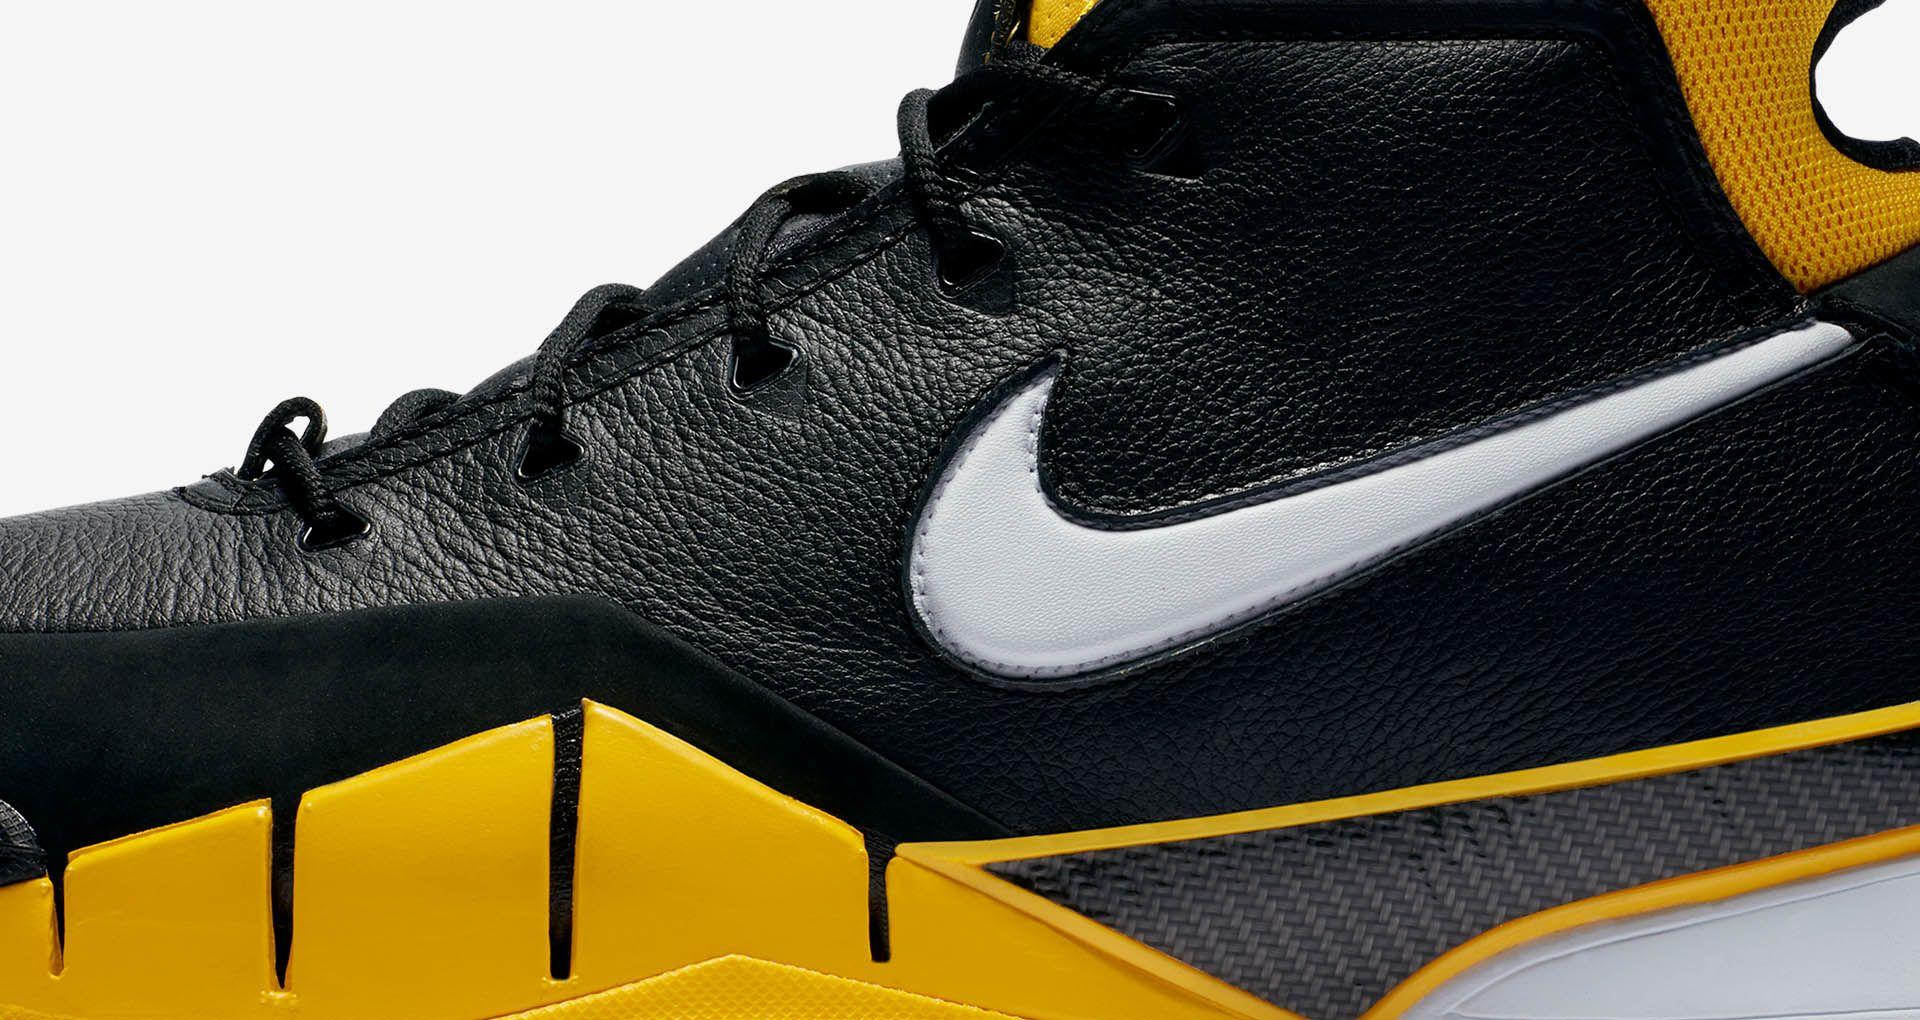 51b05ed24750 Nike Kobe 1 Protro  Varsity Maize  Release Date. Nike+ SNKRS